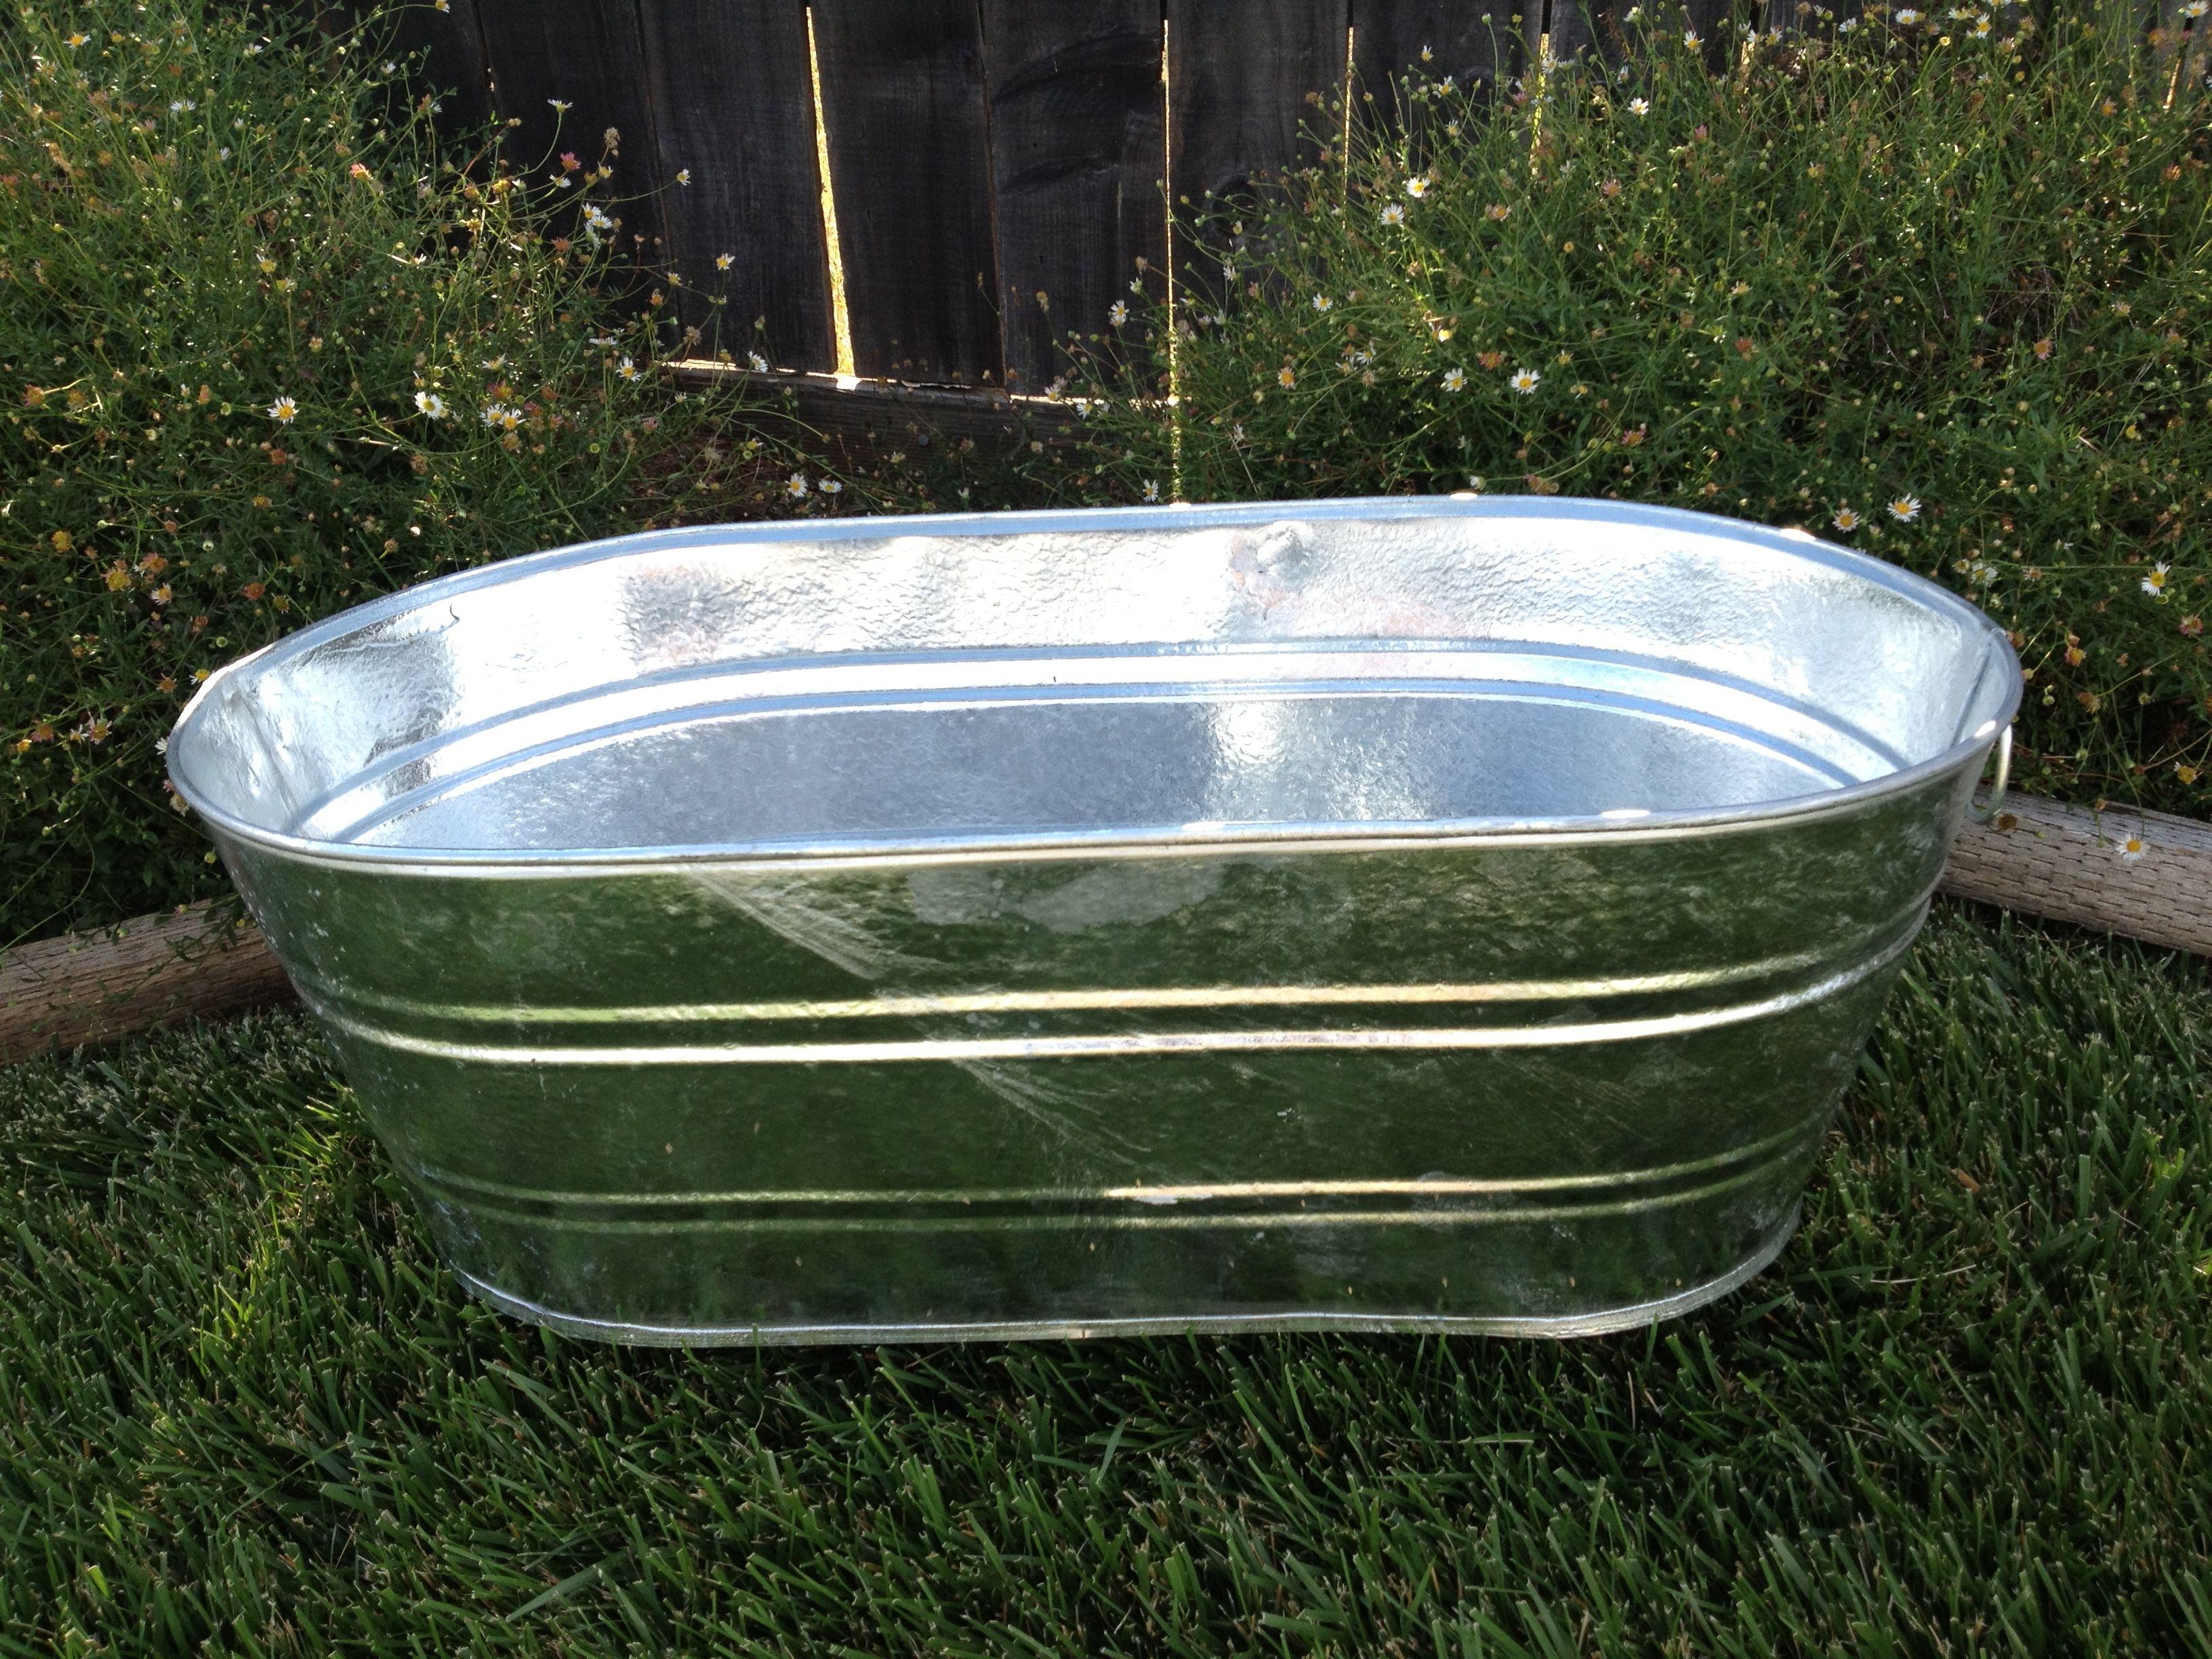 Diy Structured Flower Garden Tubs For Sale Bathtubs For Sale Galvanized Tub